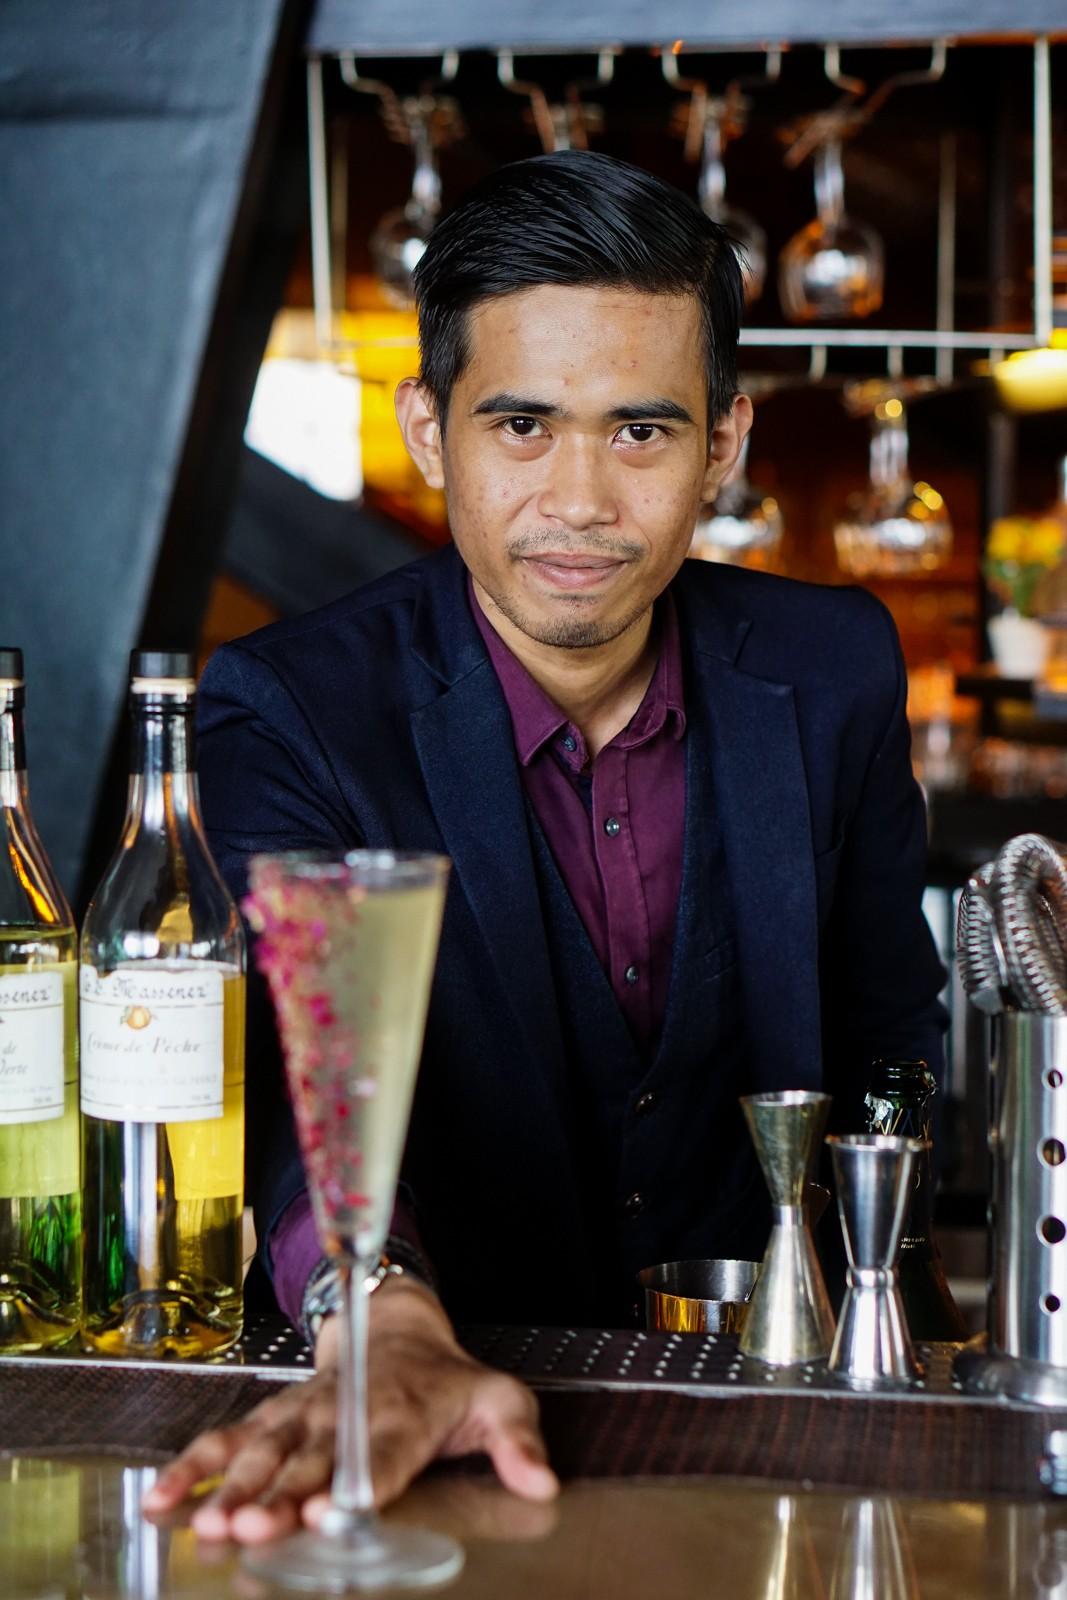 Bartenders Day in 2019